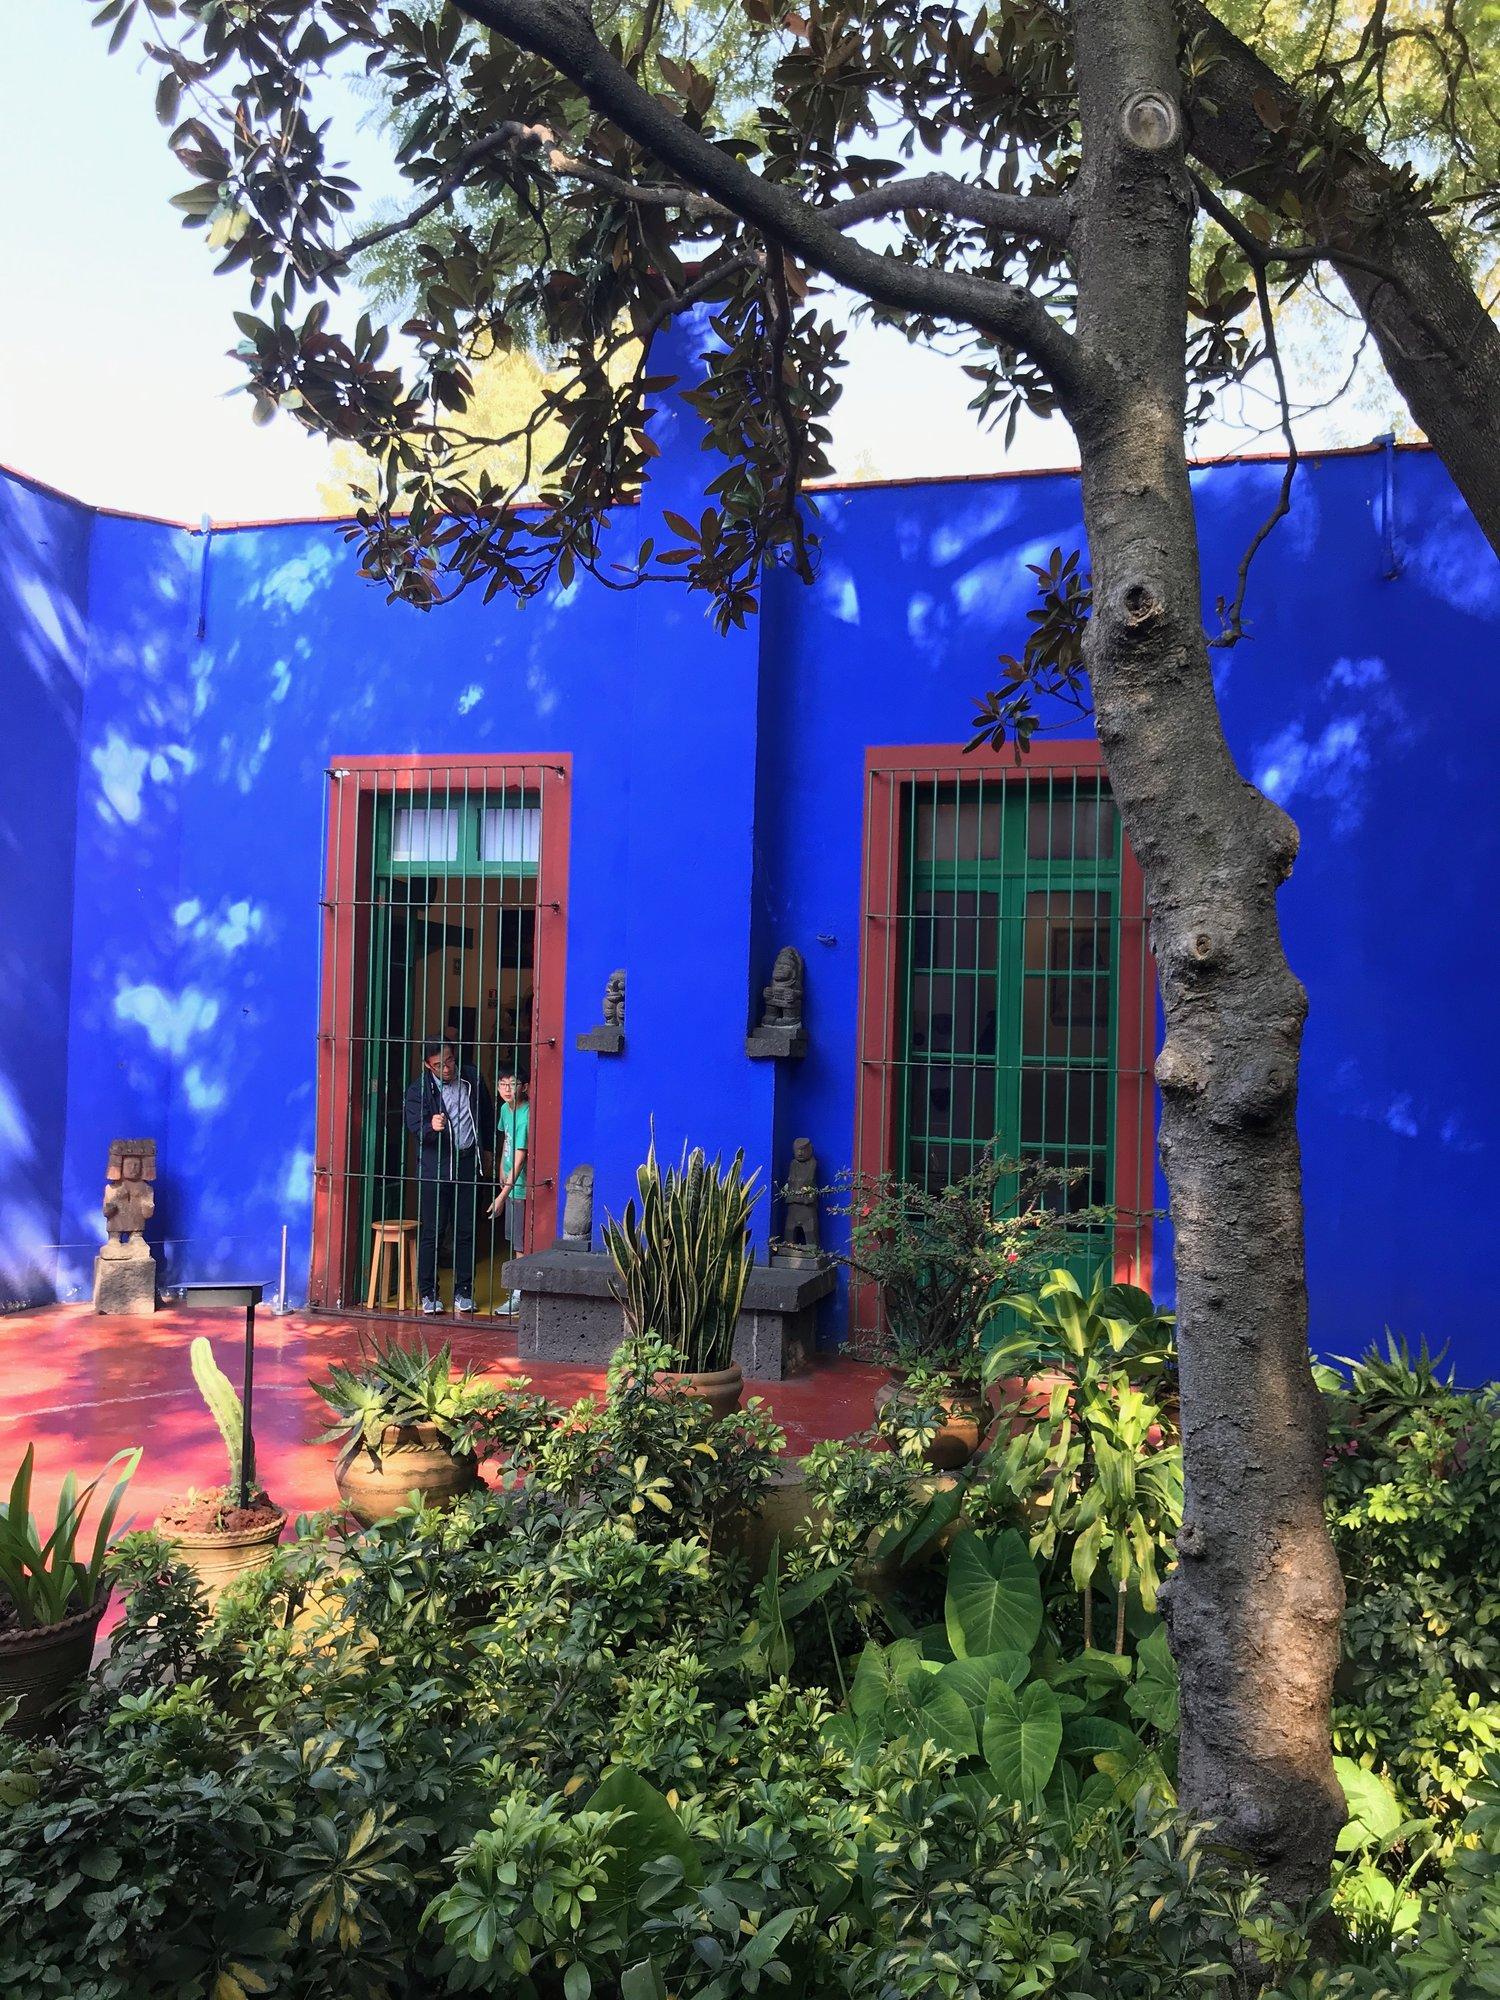 La Casa Azul The Frida Kahlo Museum In Mexico City